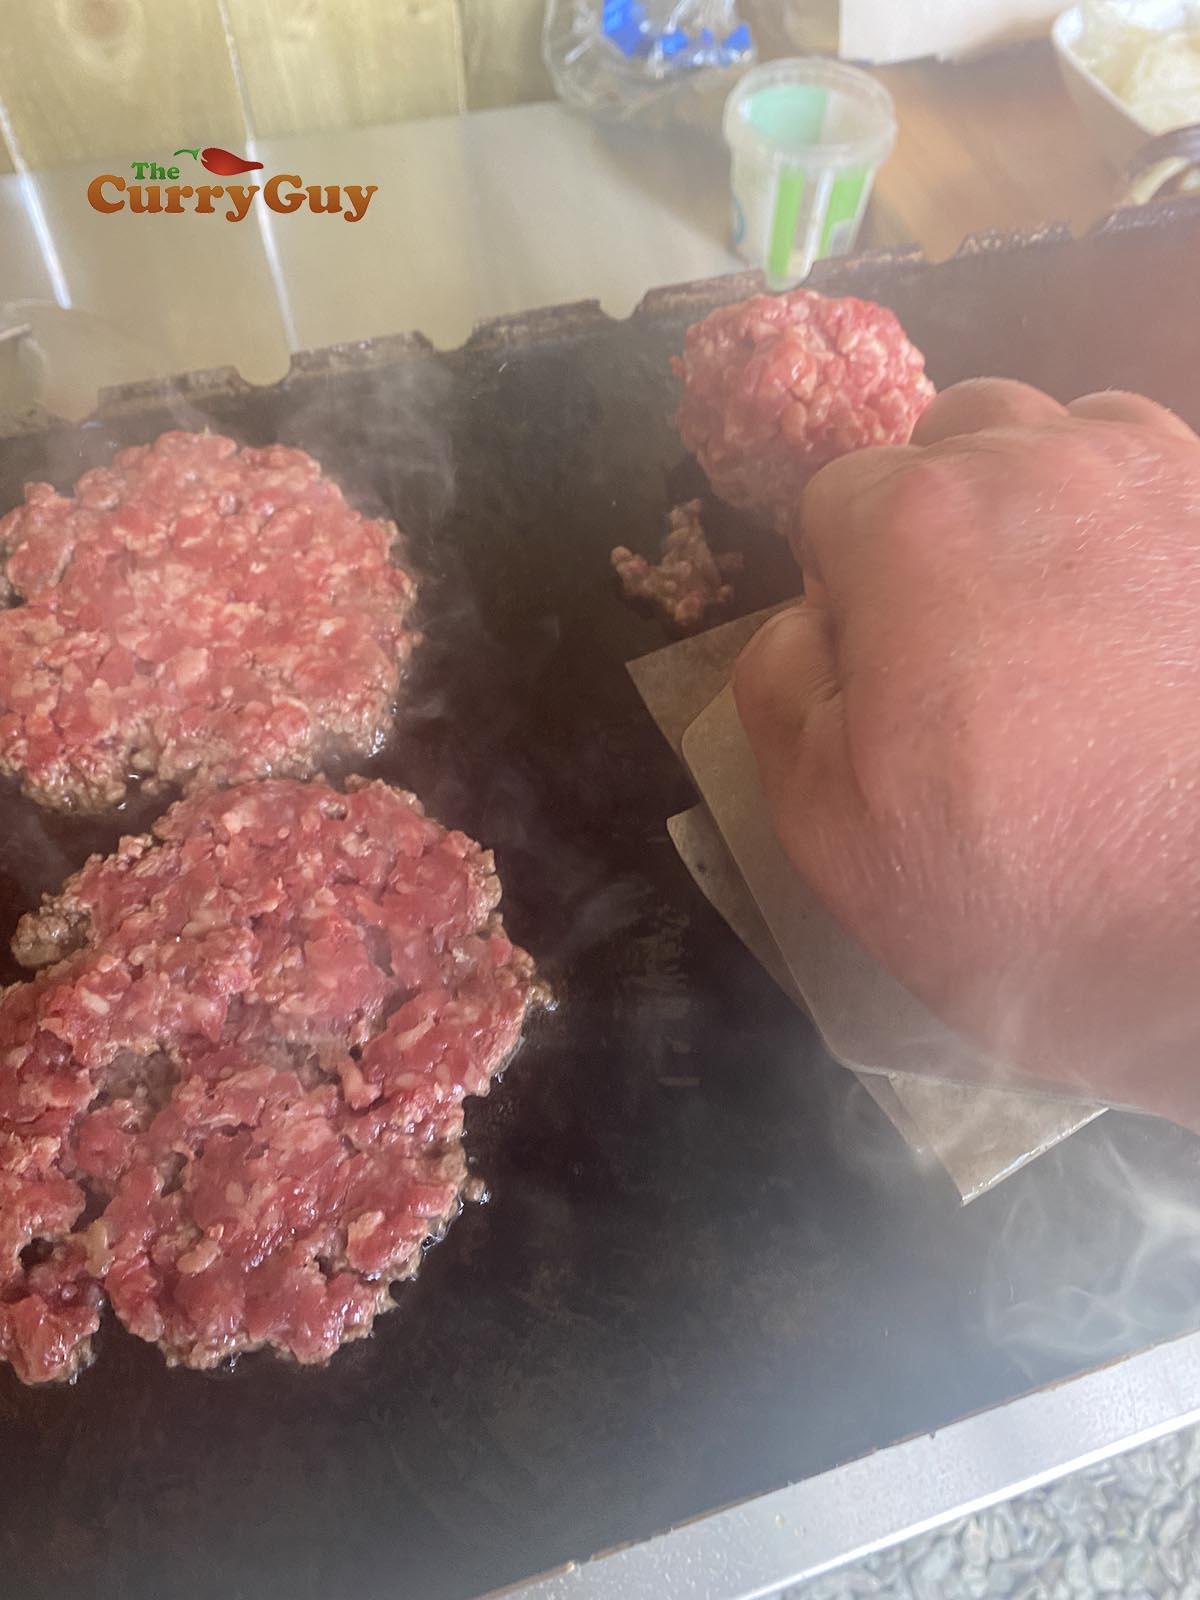 Pressing burgers